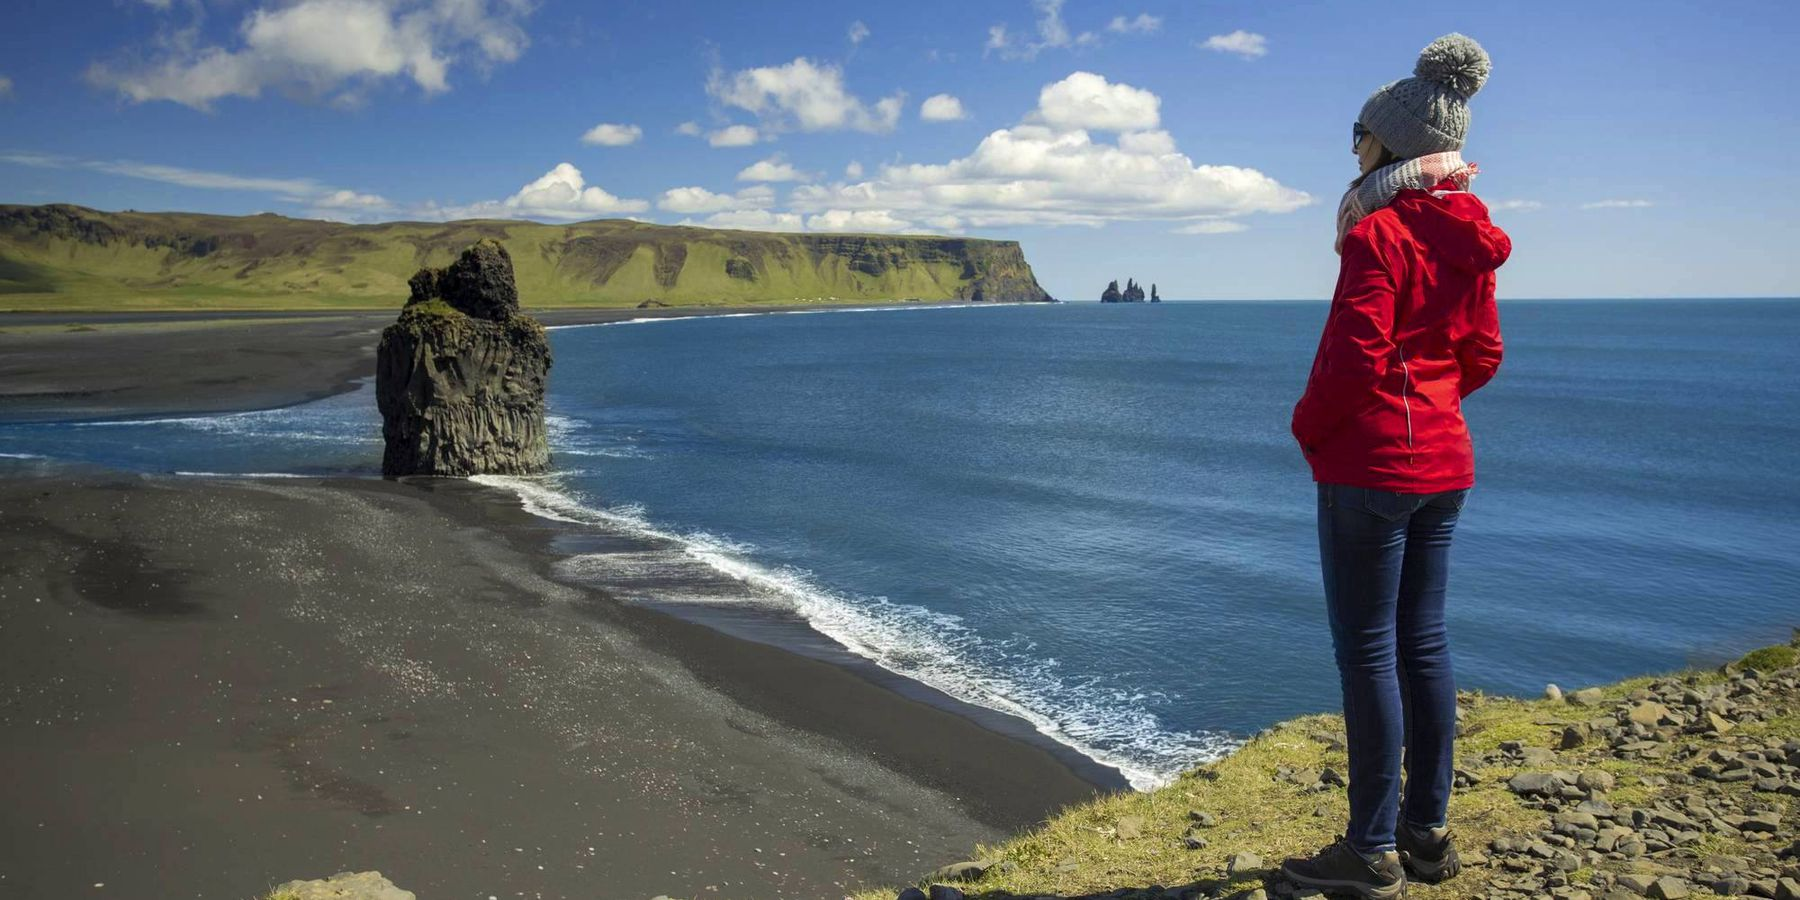 Zuidkust IJsland - Doets Reizen